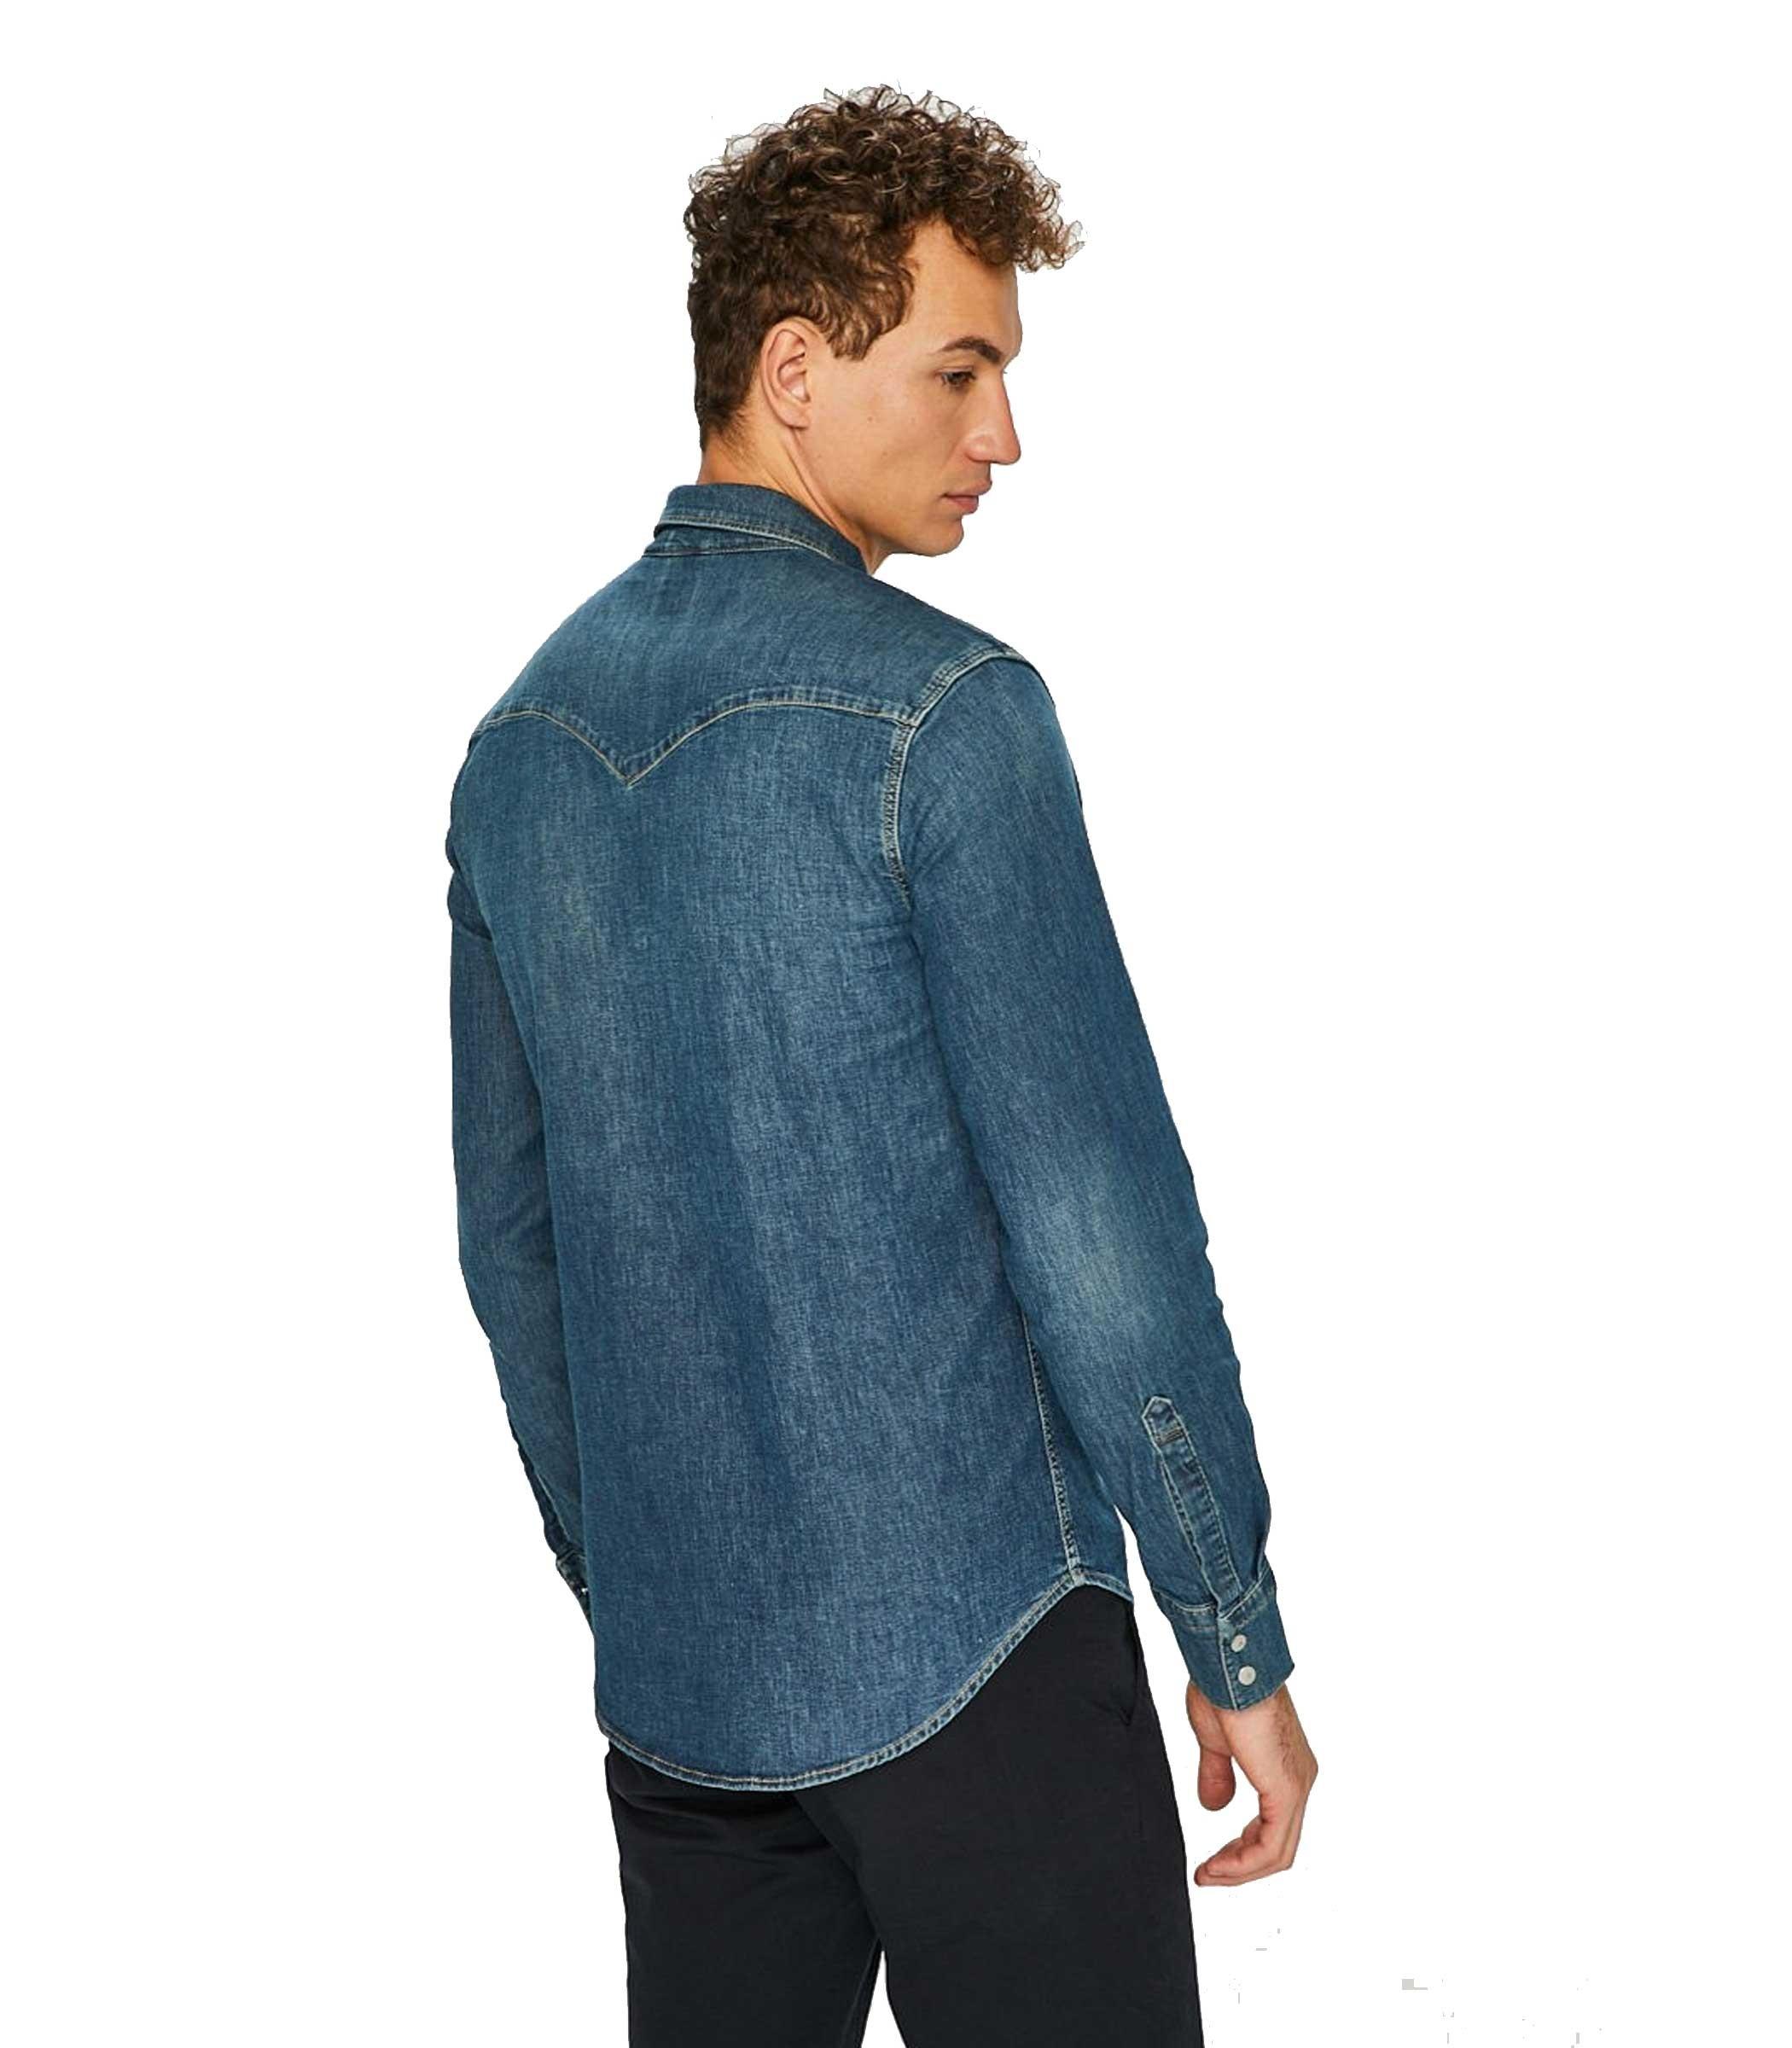 Jeans Da 0300 Uomo Denim Camicia Levi's Rif65816 CrdoxBe